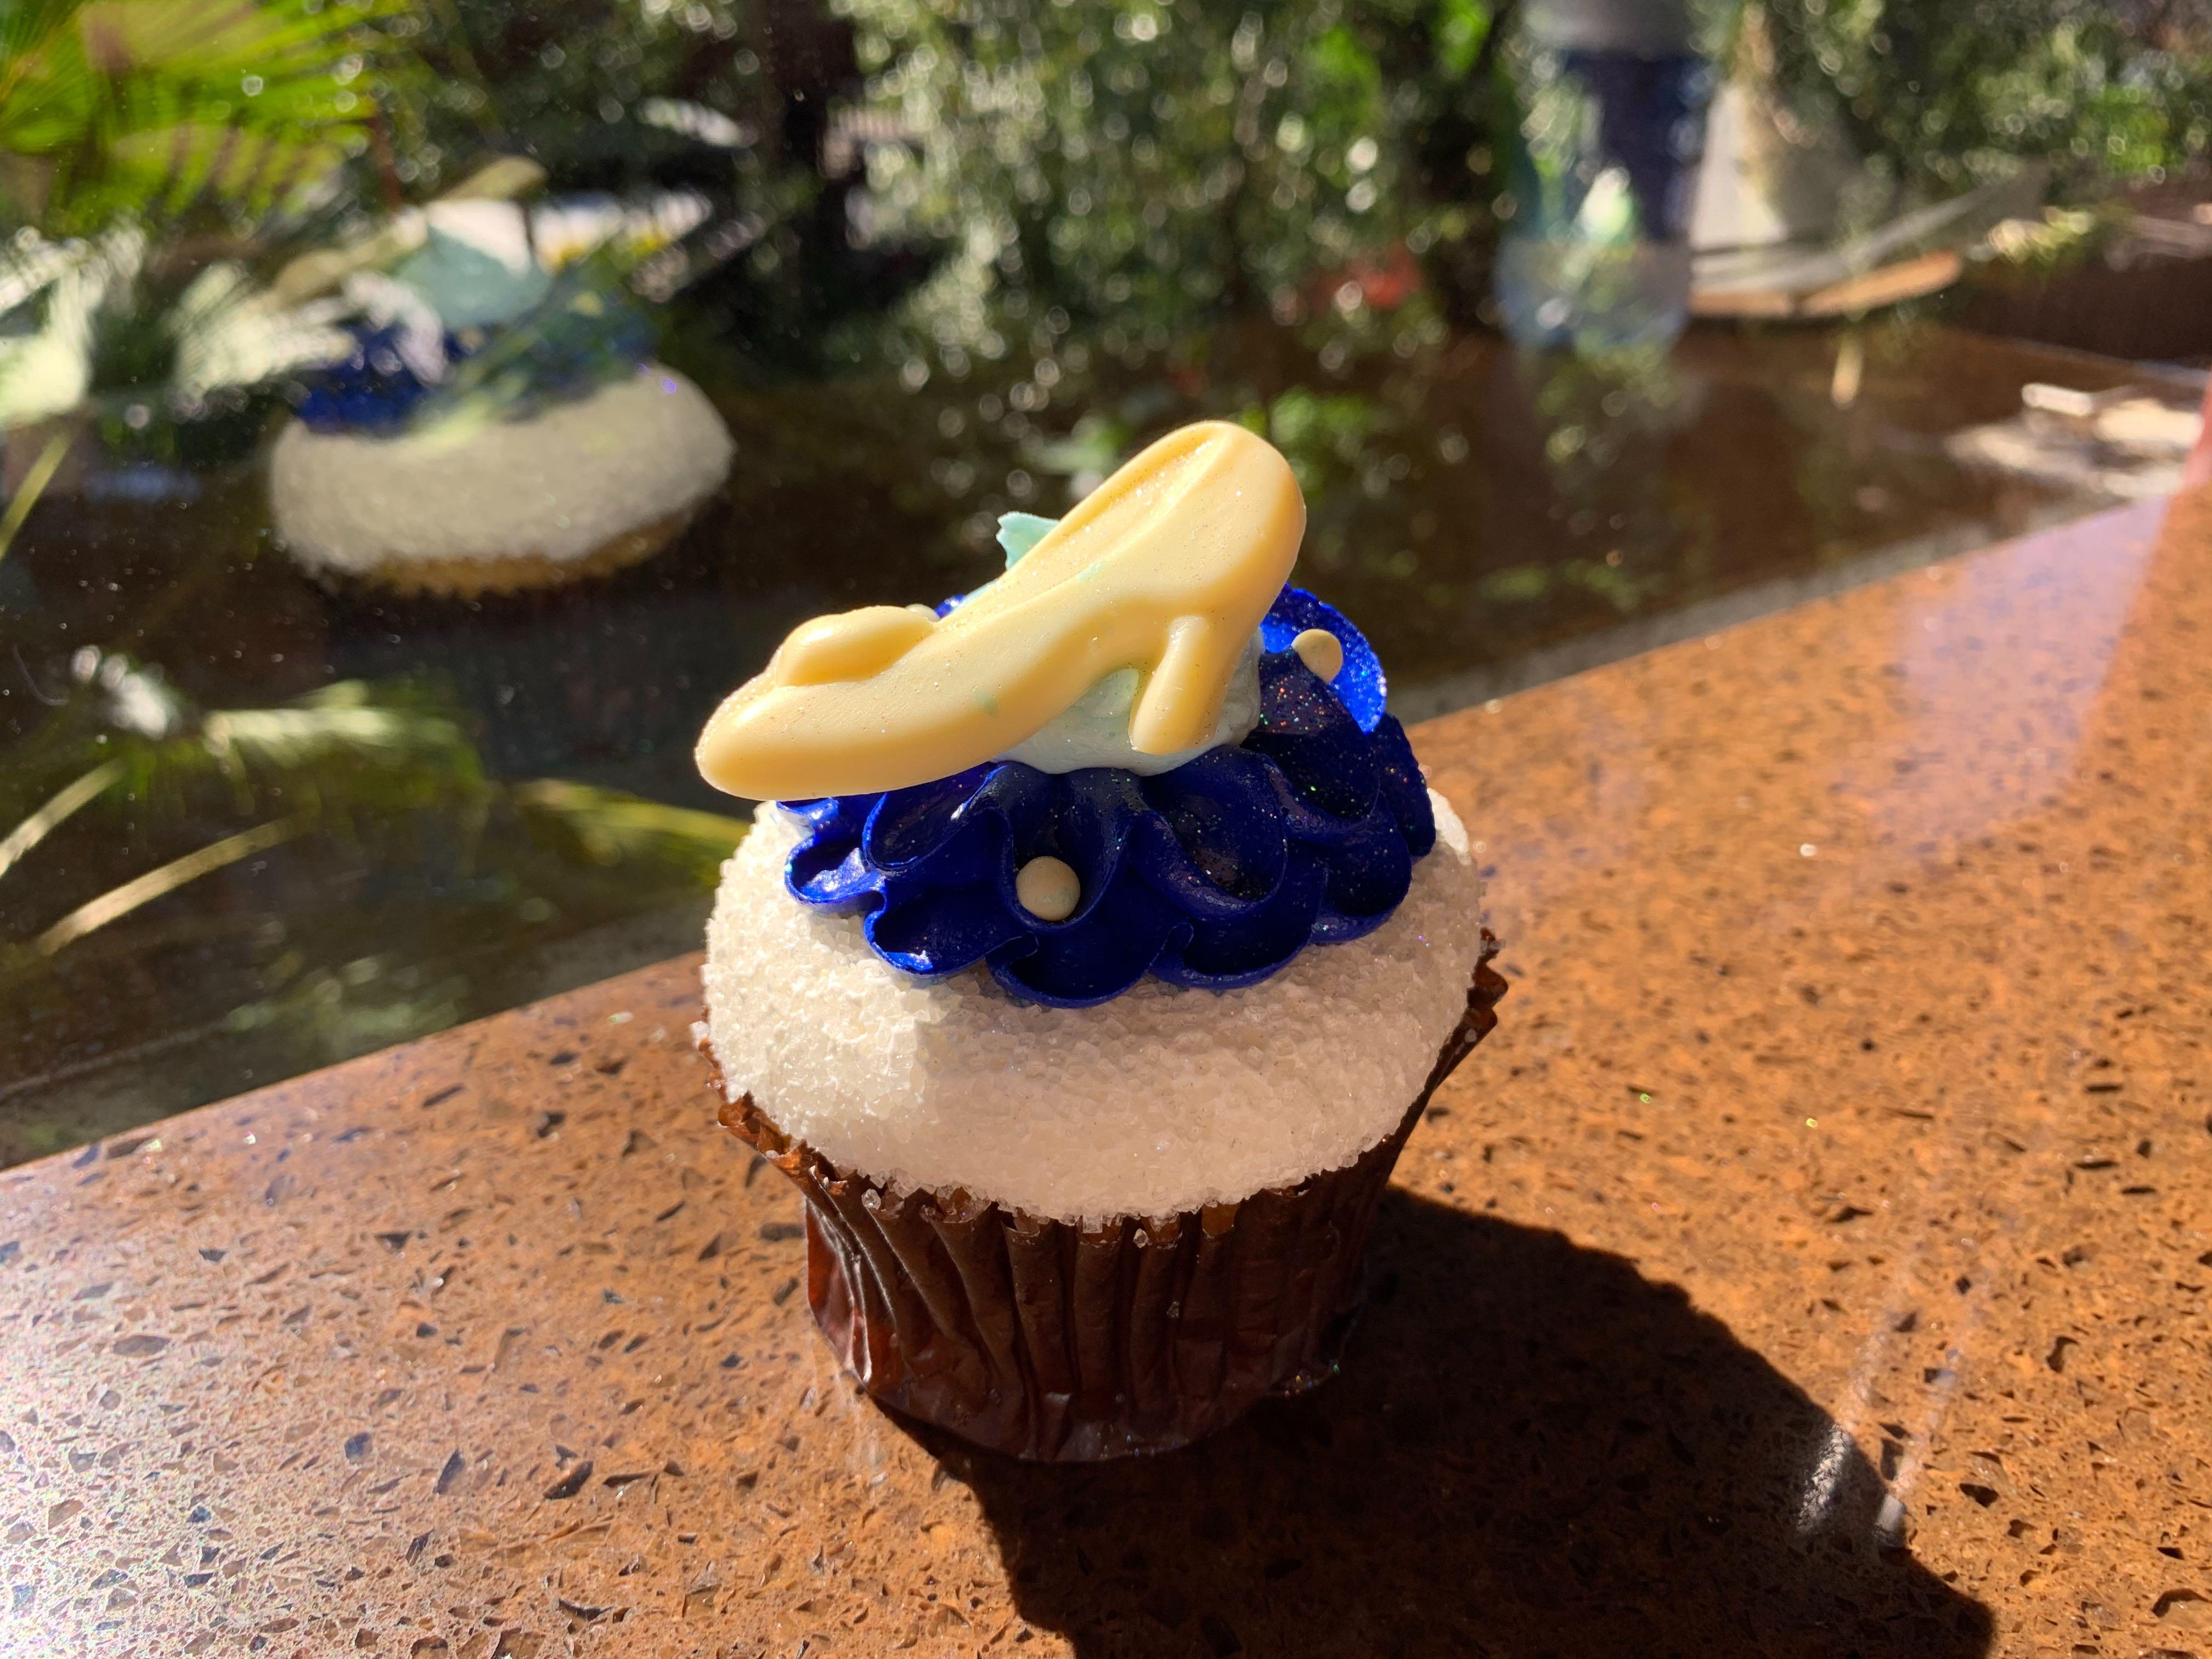 cinderella-cupcake-polynesian-poly-02-02-2020-2.jpg